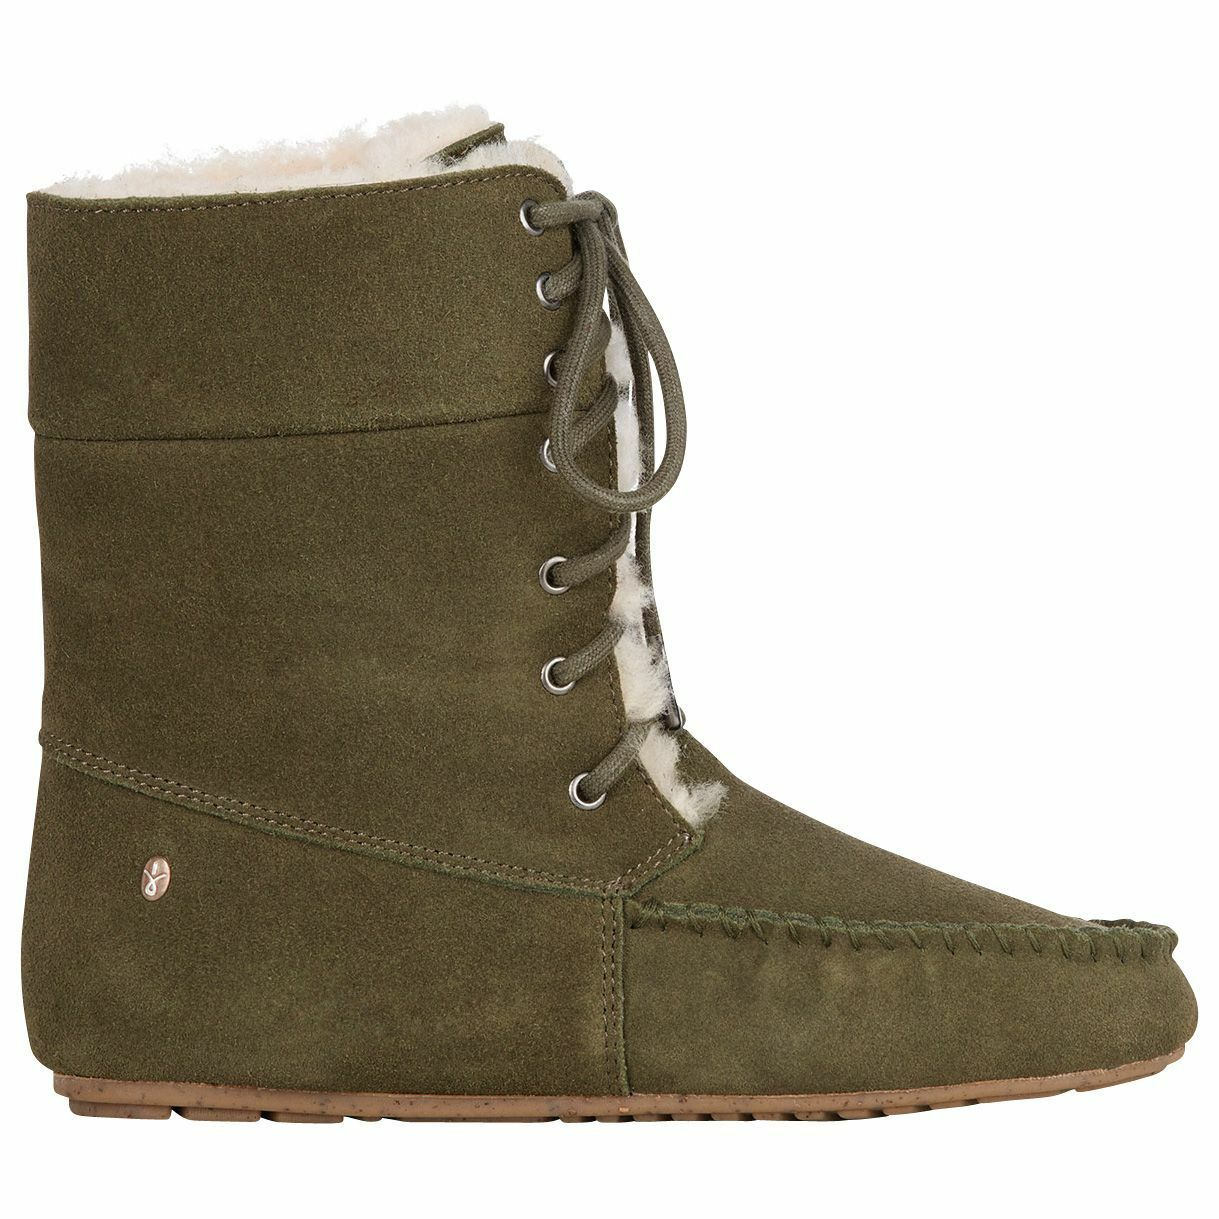 Women's Emu Australia Brooklyn Bootie Khaki Size 9 9 9  NJZZ8-645 95ee87